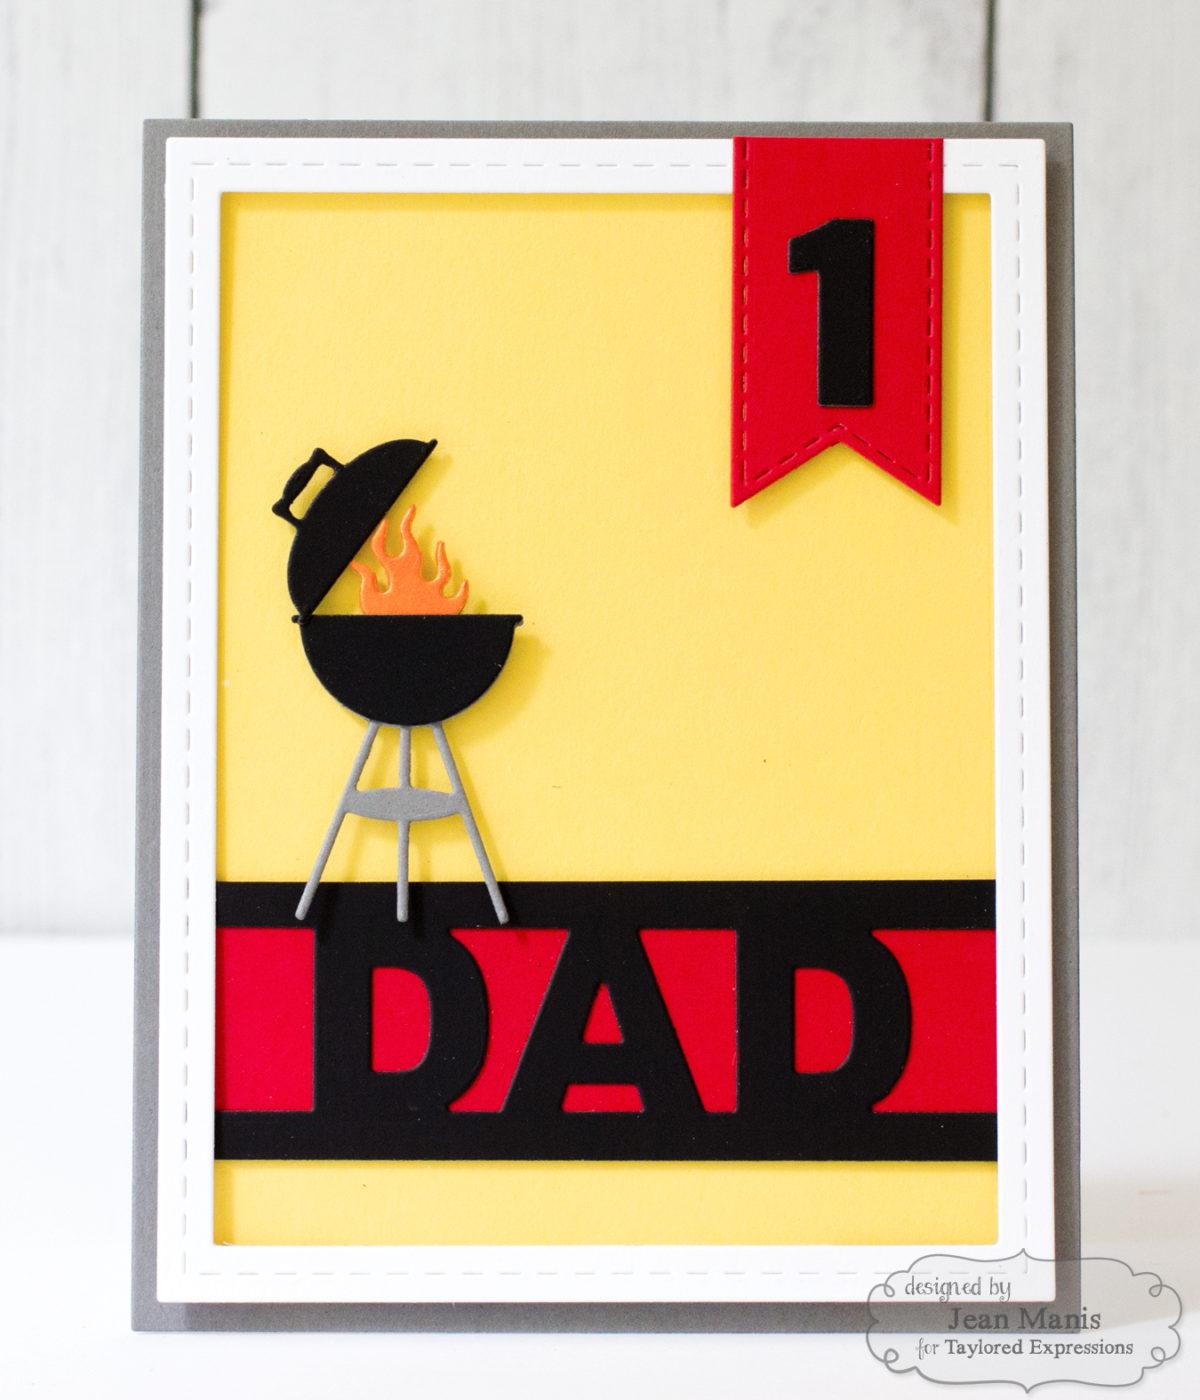 #1 Dad – TE Share Joy Challenge #34